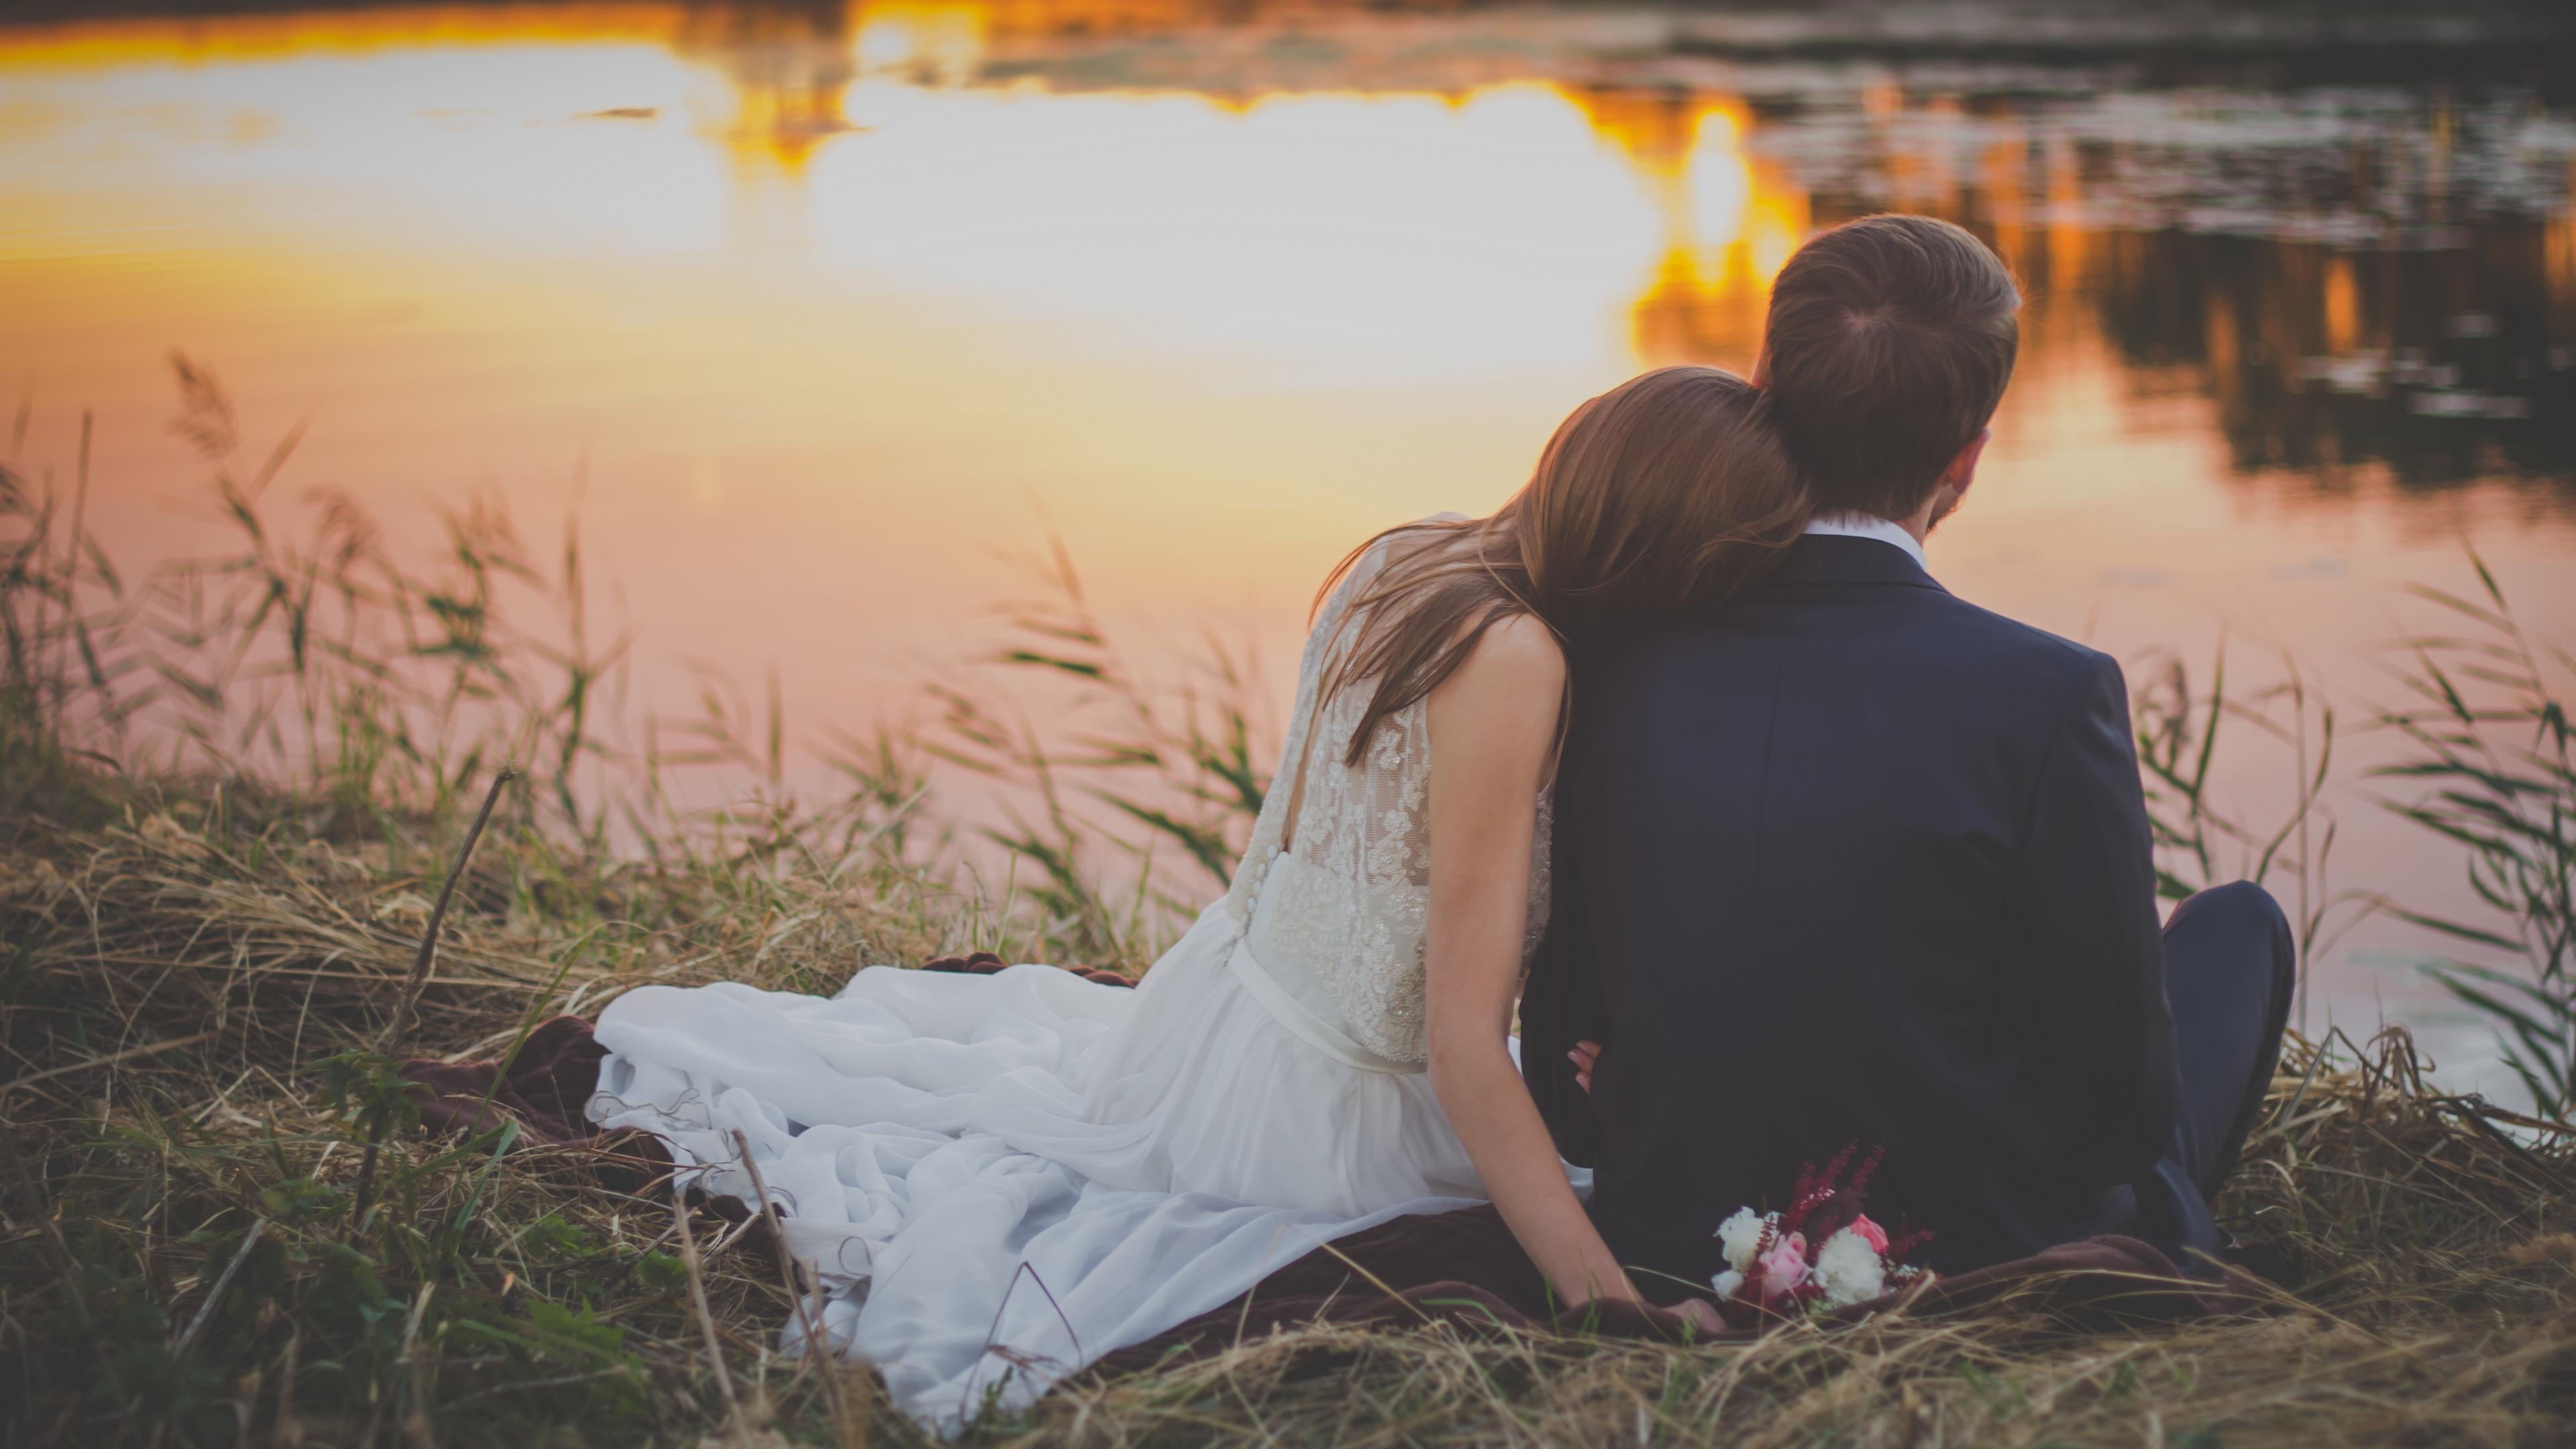 wedding newlyweds couple romance love 4k 1538344728 - wedding, newlyweds, couple, romance, love 4k - Wedding, newlyweds, Couple